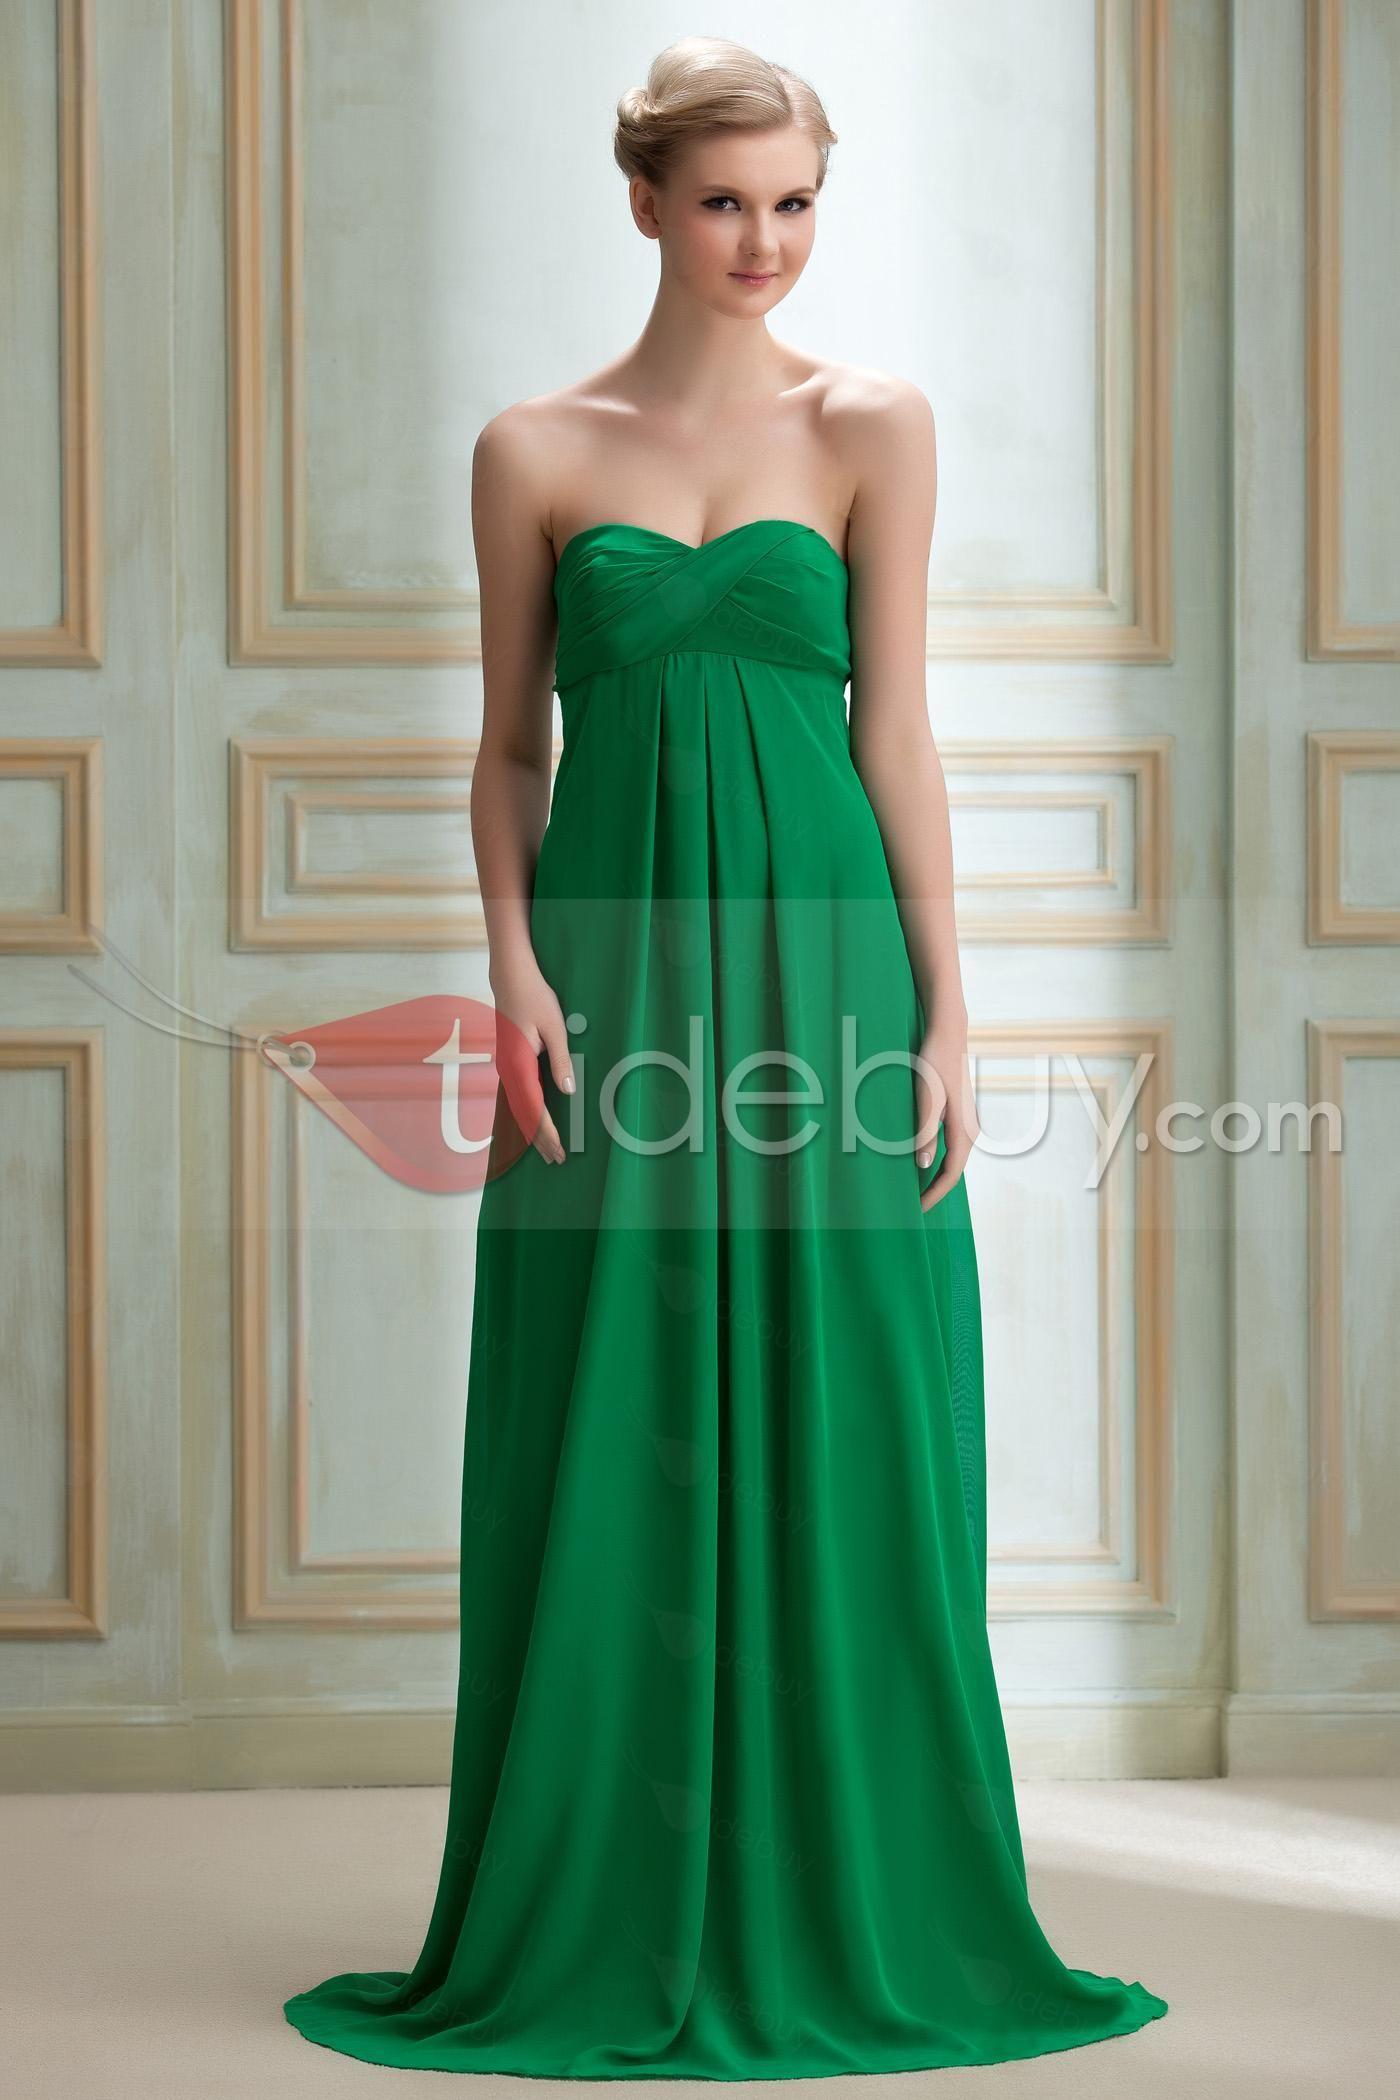 Best selling aline strapless empire waistline yanaus long